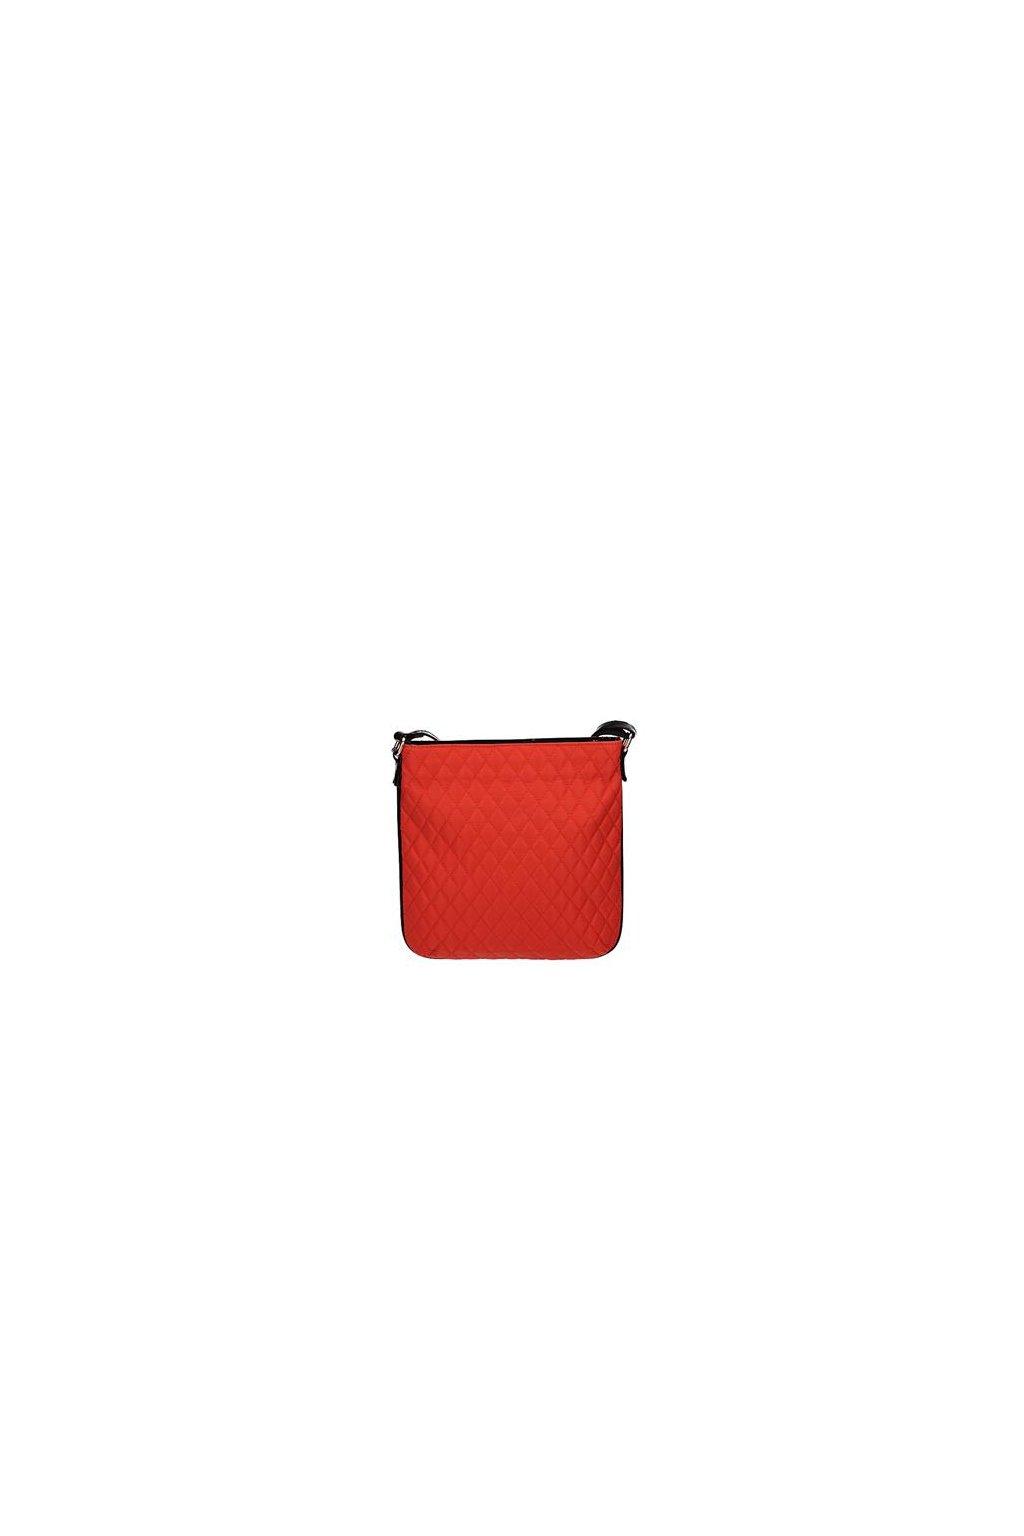 ... Oranžová crossbody kabelka MONNARI BAG 0752-003 W16 cc61c1e1dd8